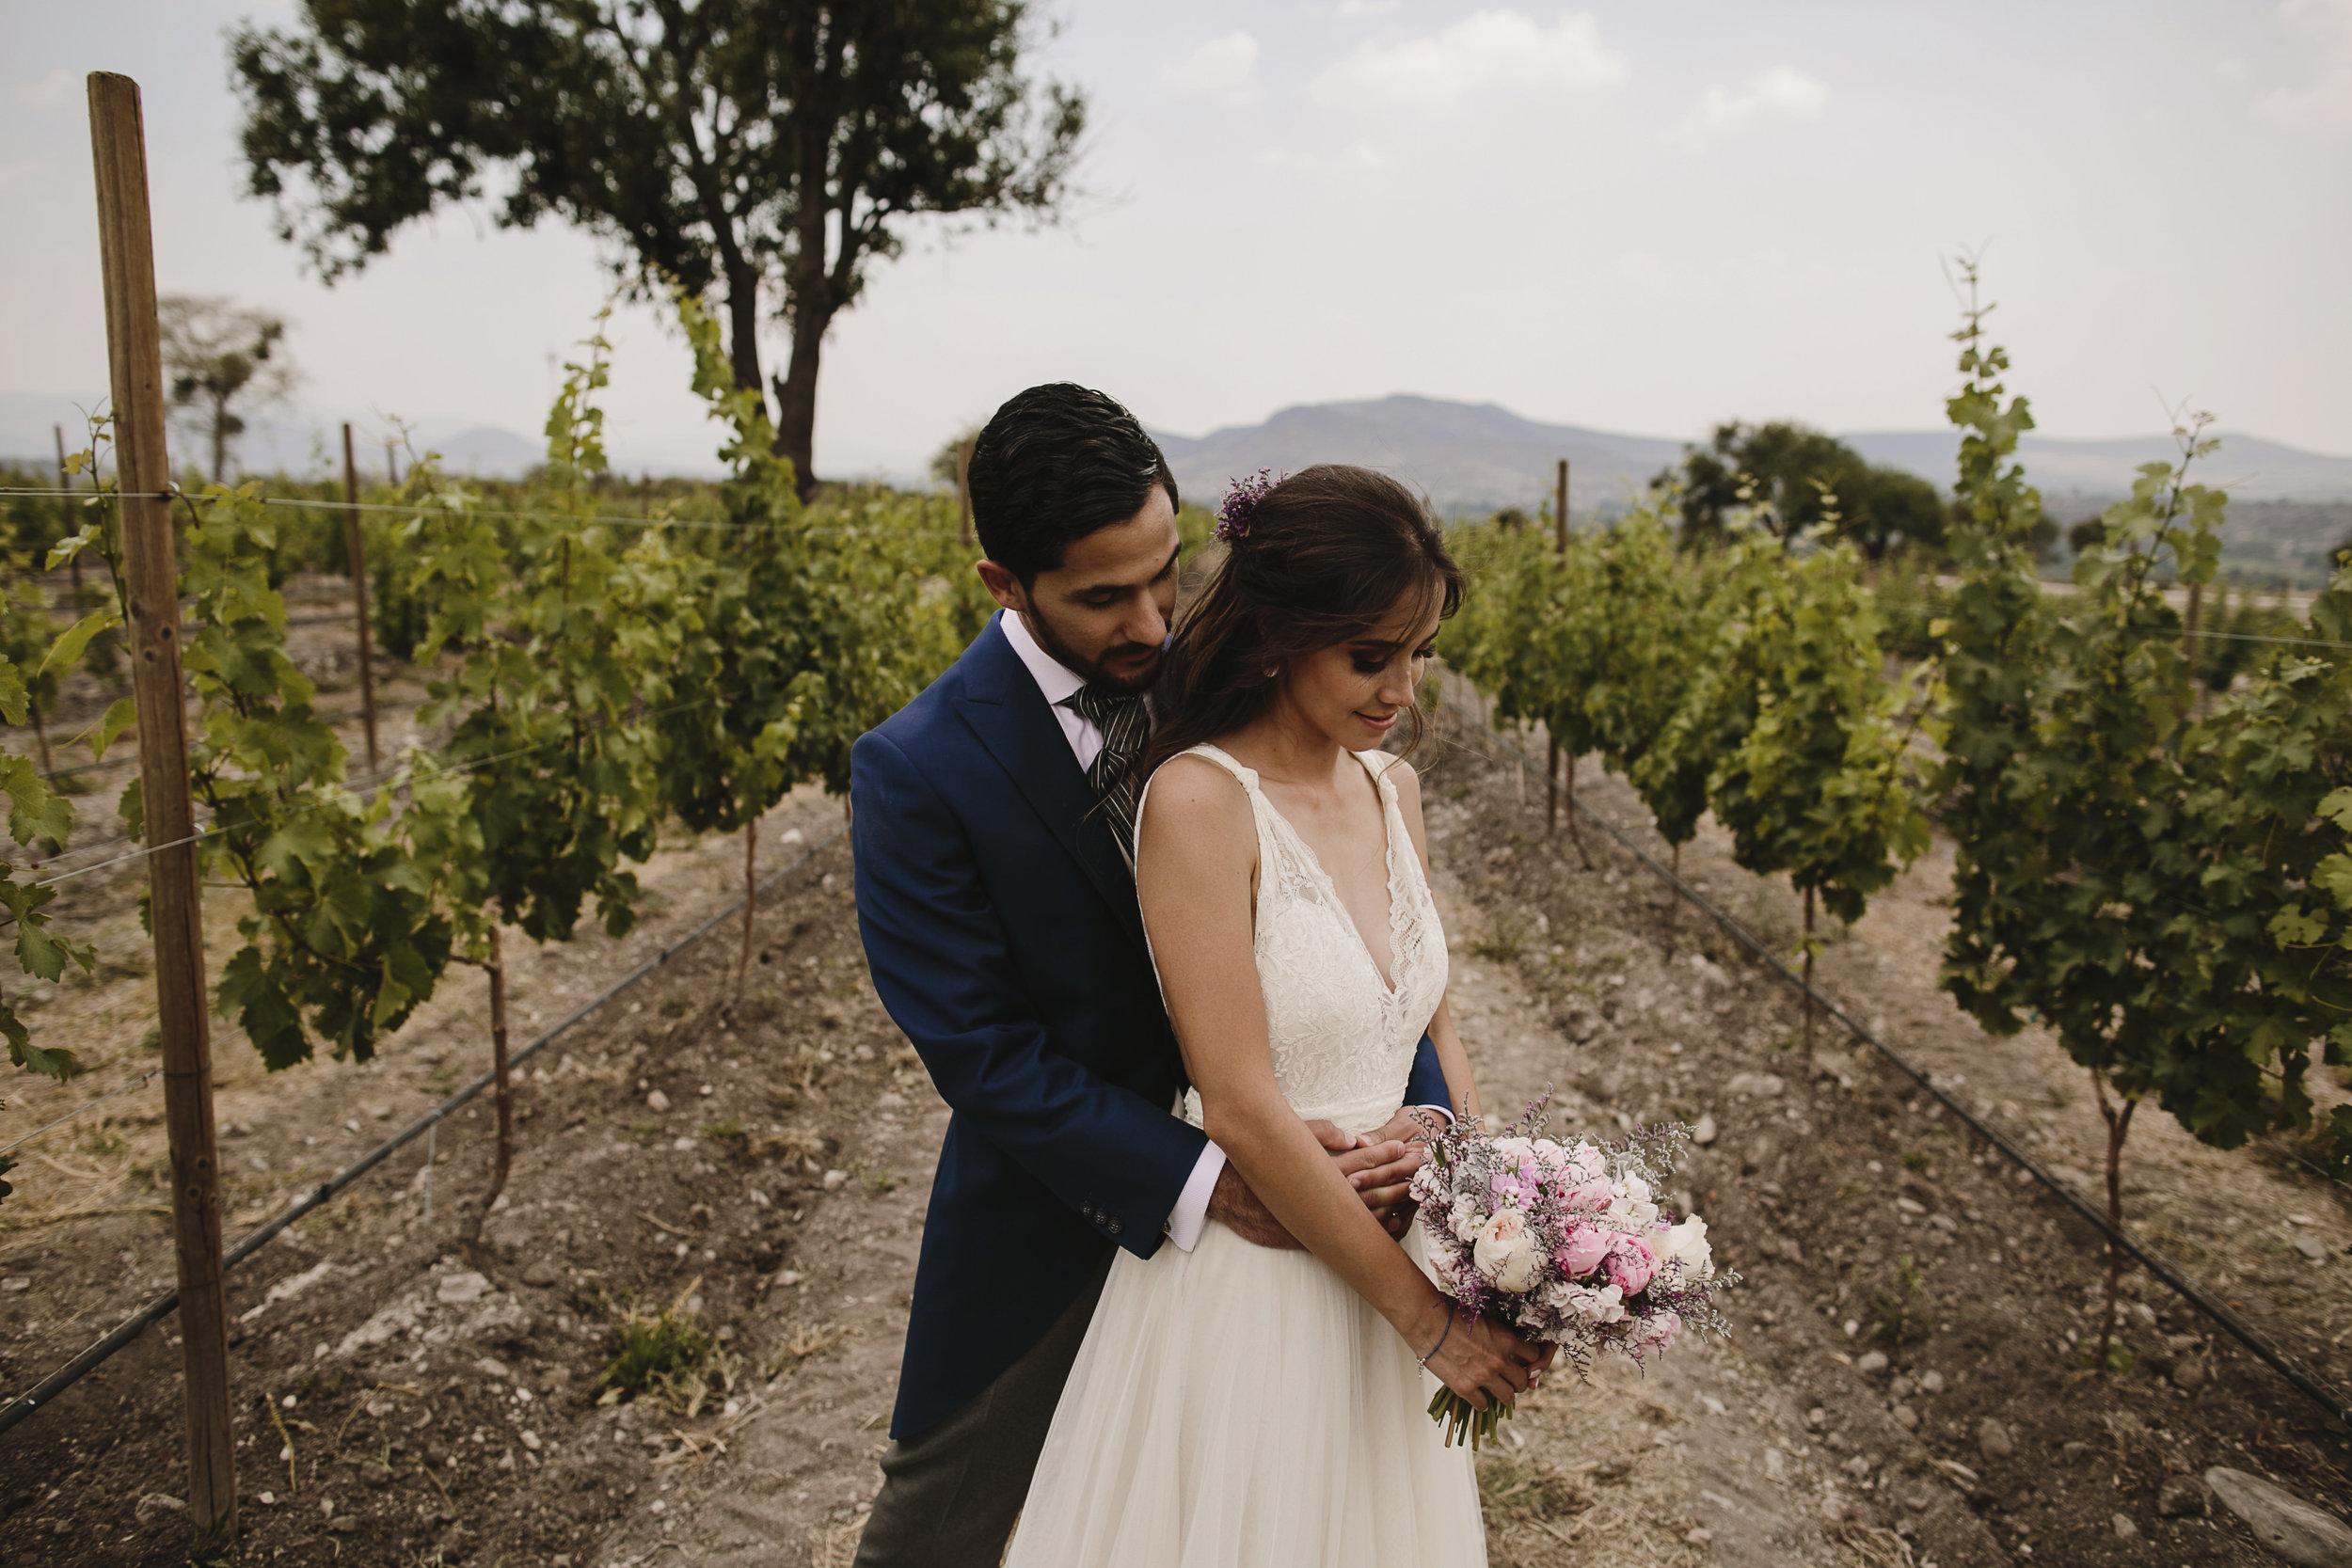 alfons_flores_destination_wedding_photography_mavi_david-1279.JPG